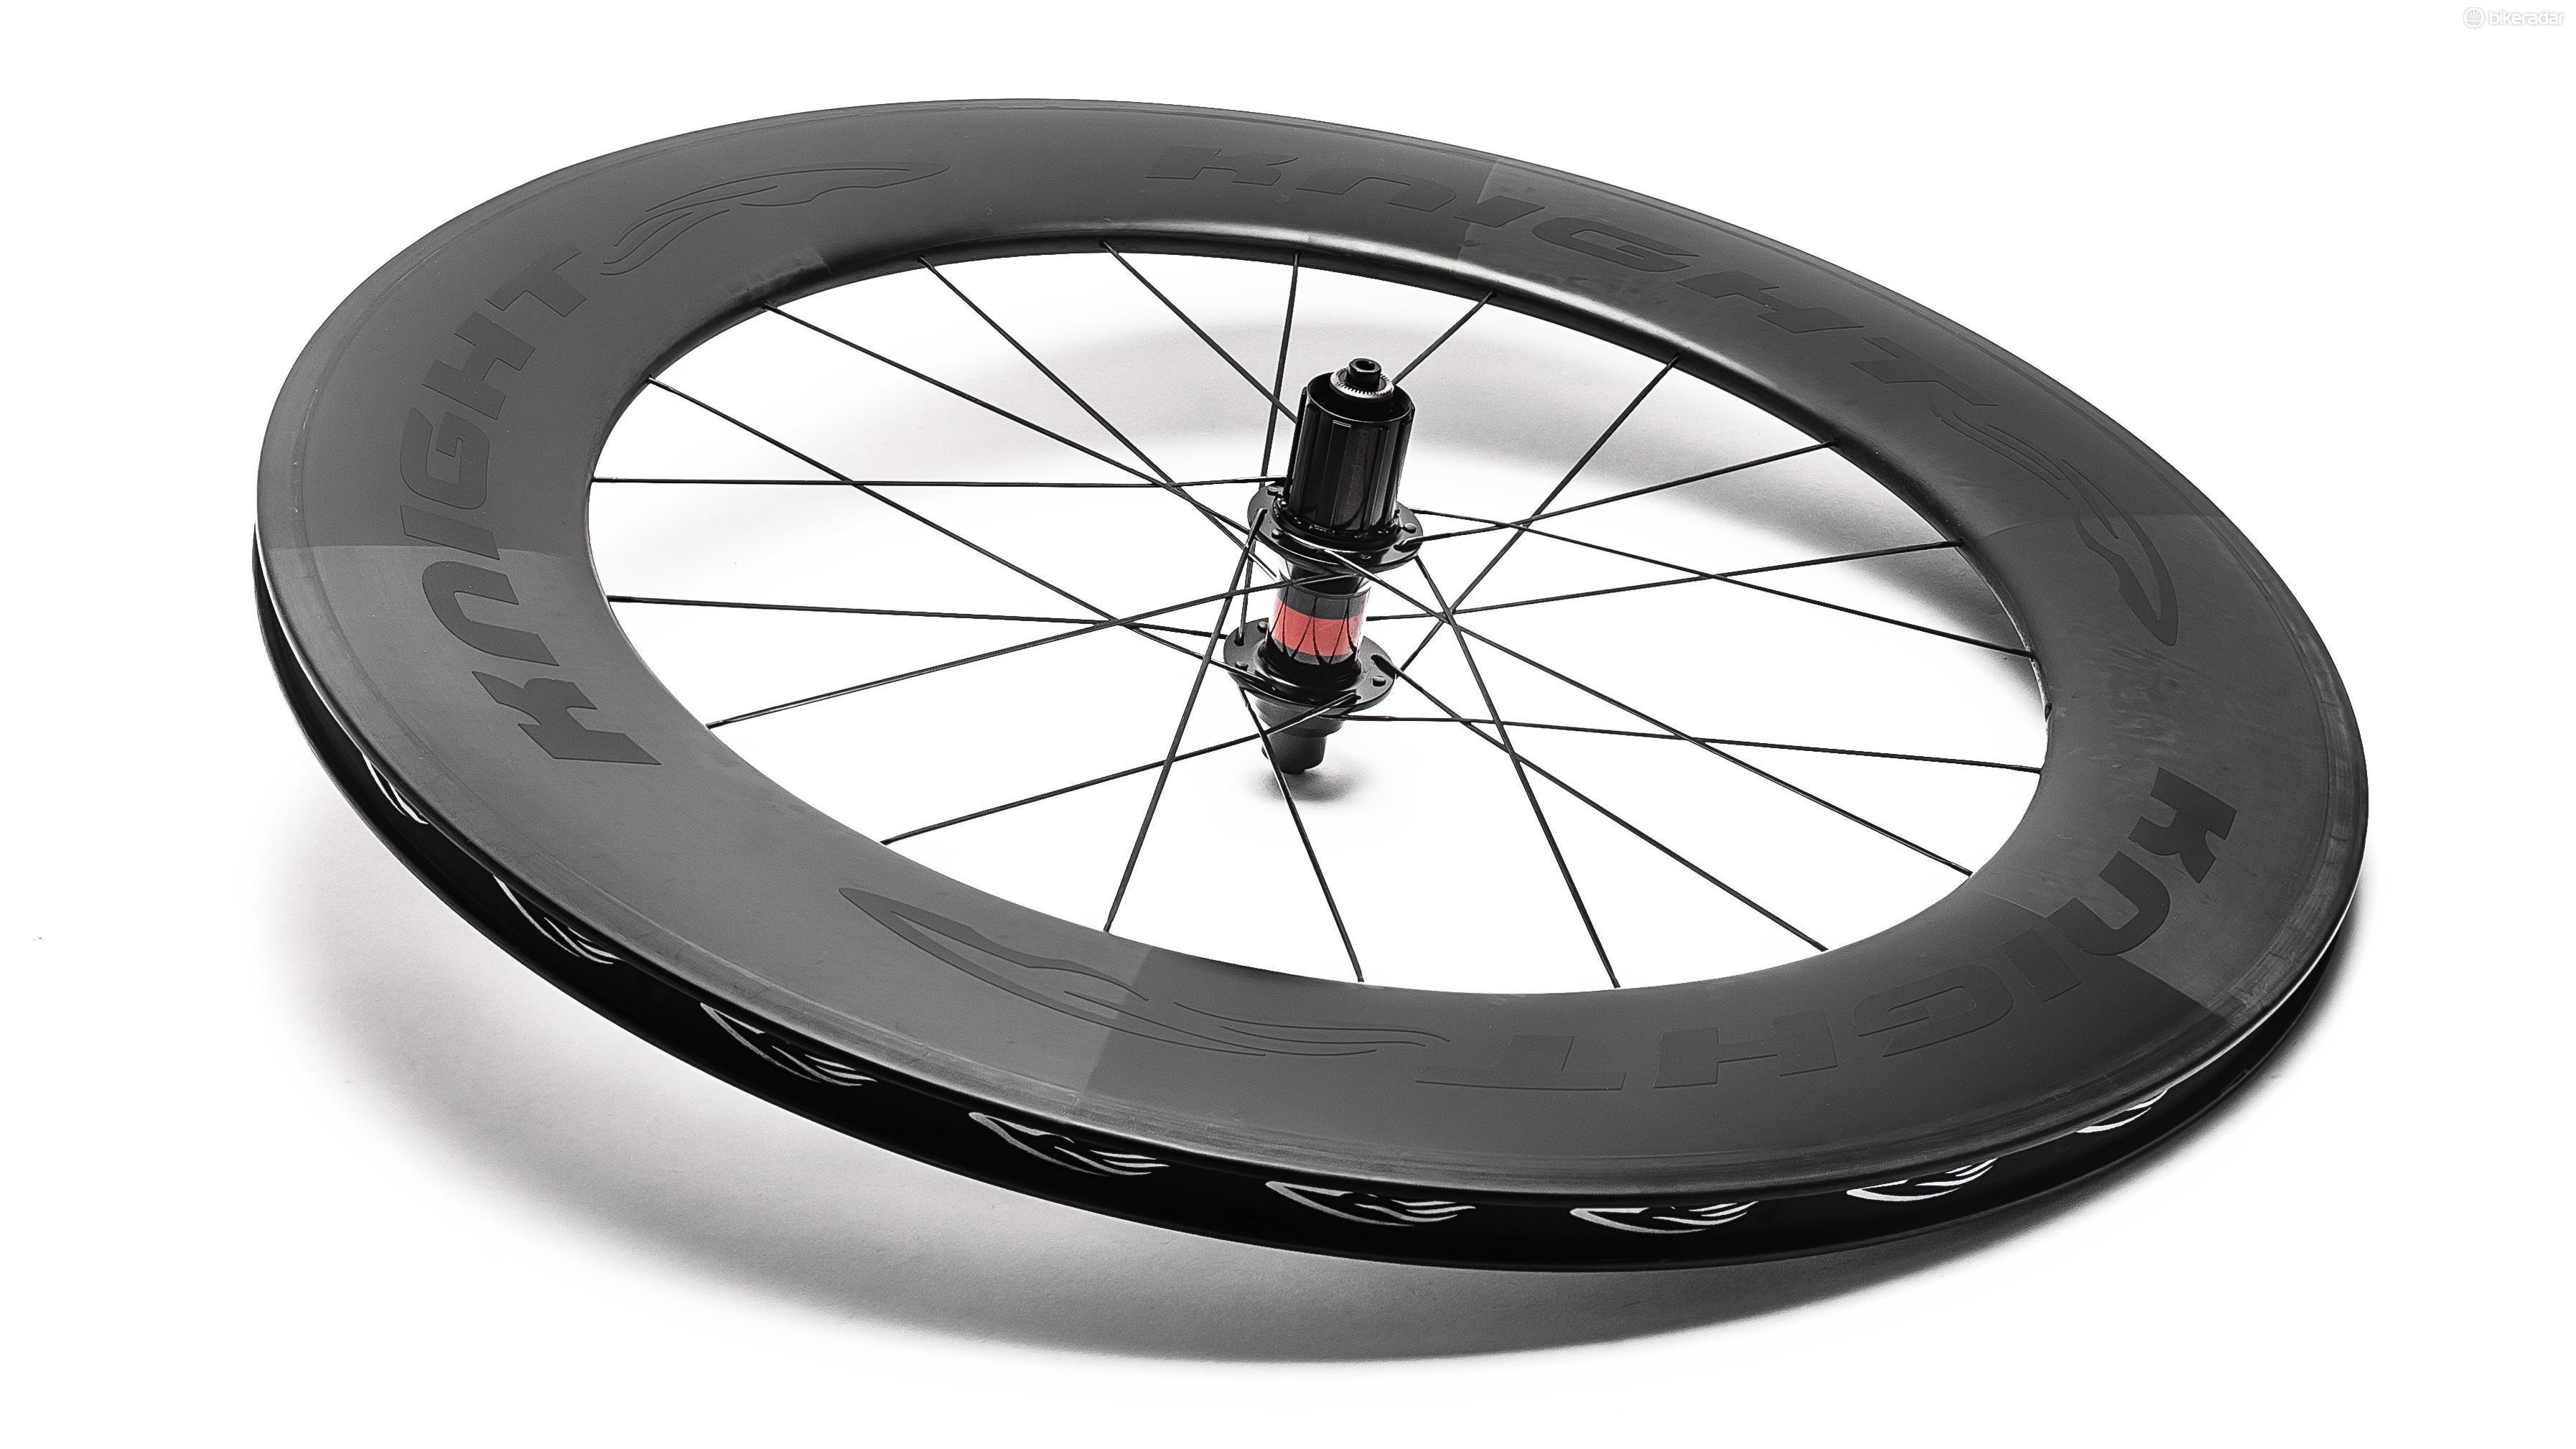 a3e2cd4cd6b 10 of the best deep aero wheels lab tested - BikeRadar